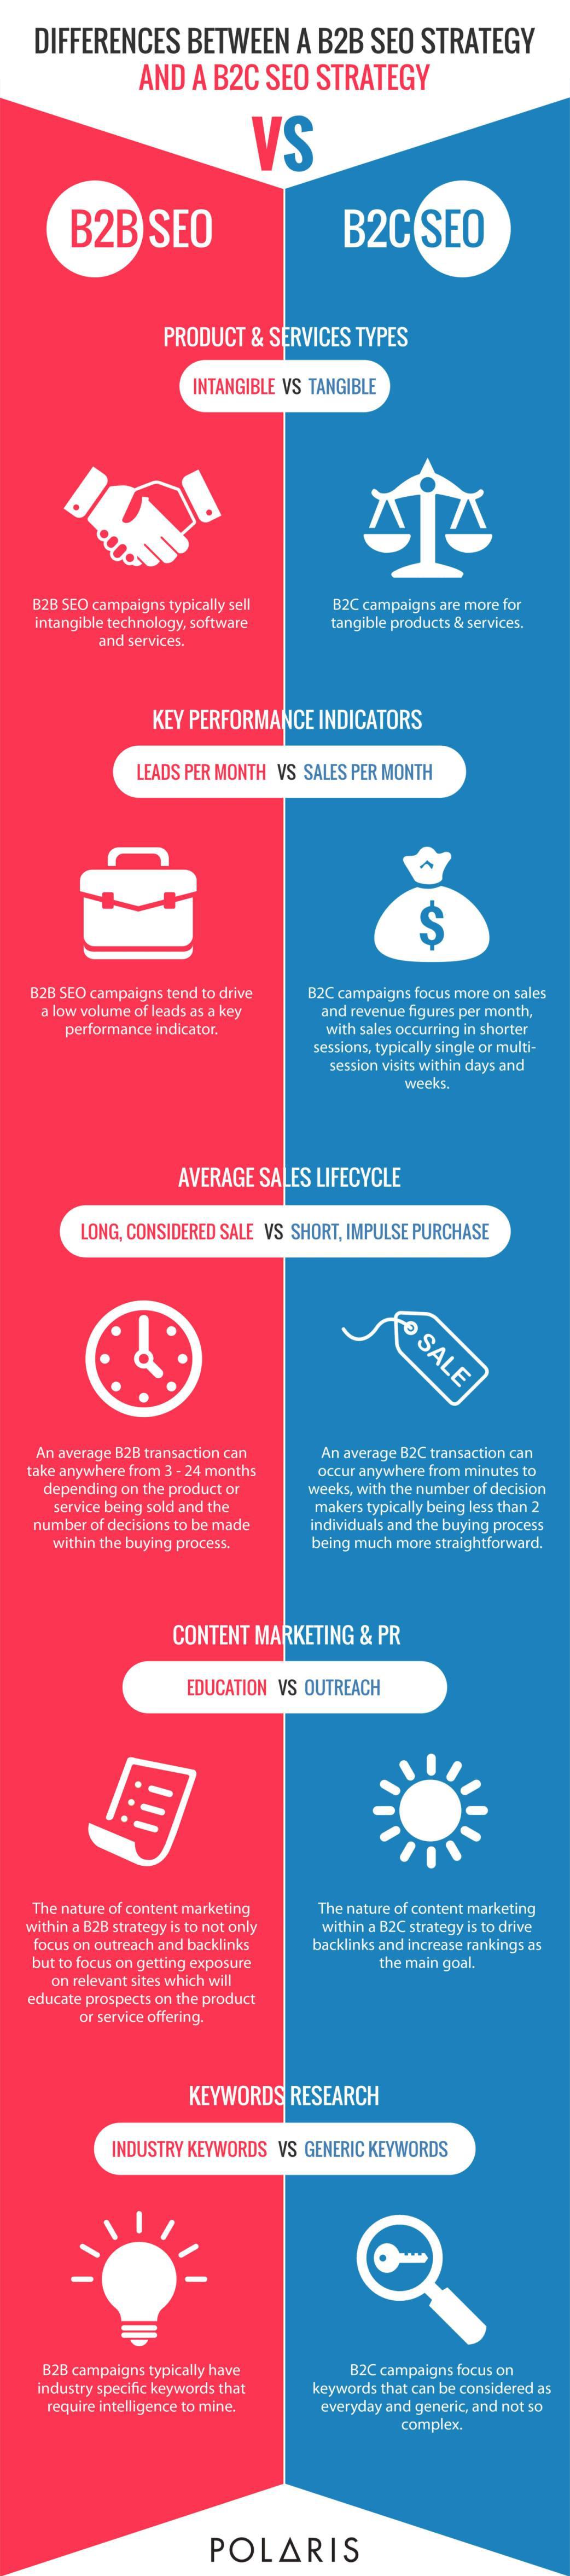 B2B v B2C SEO Infographic